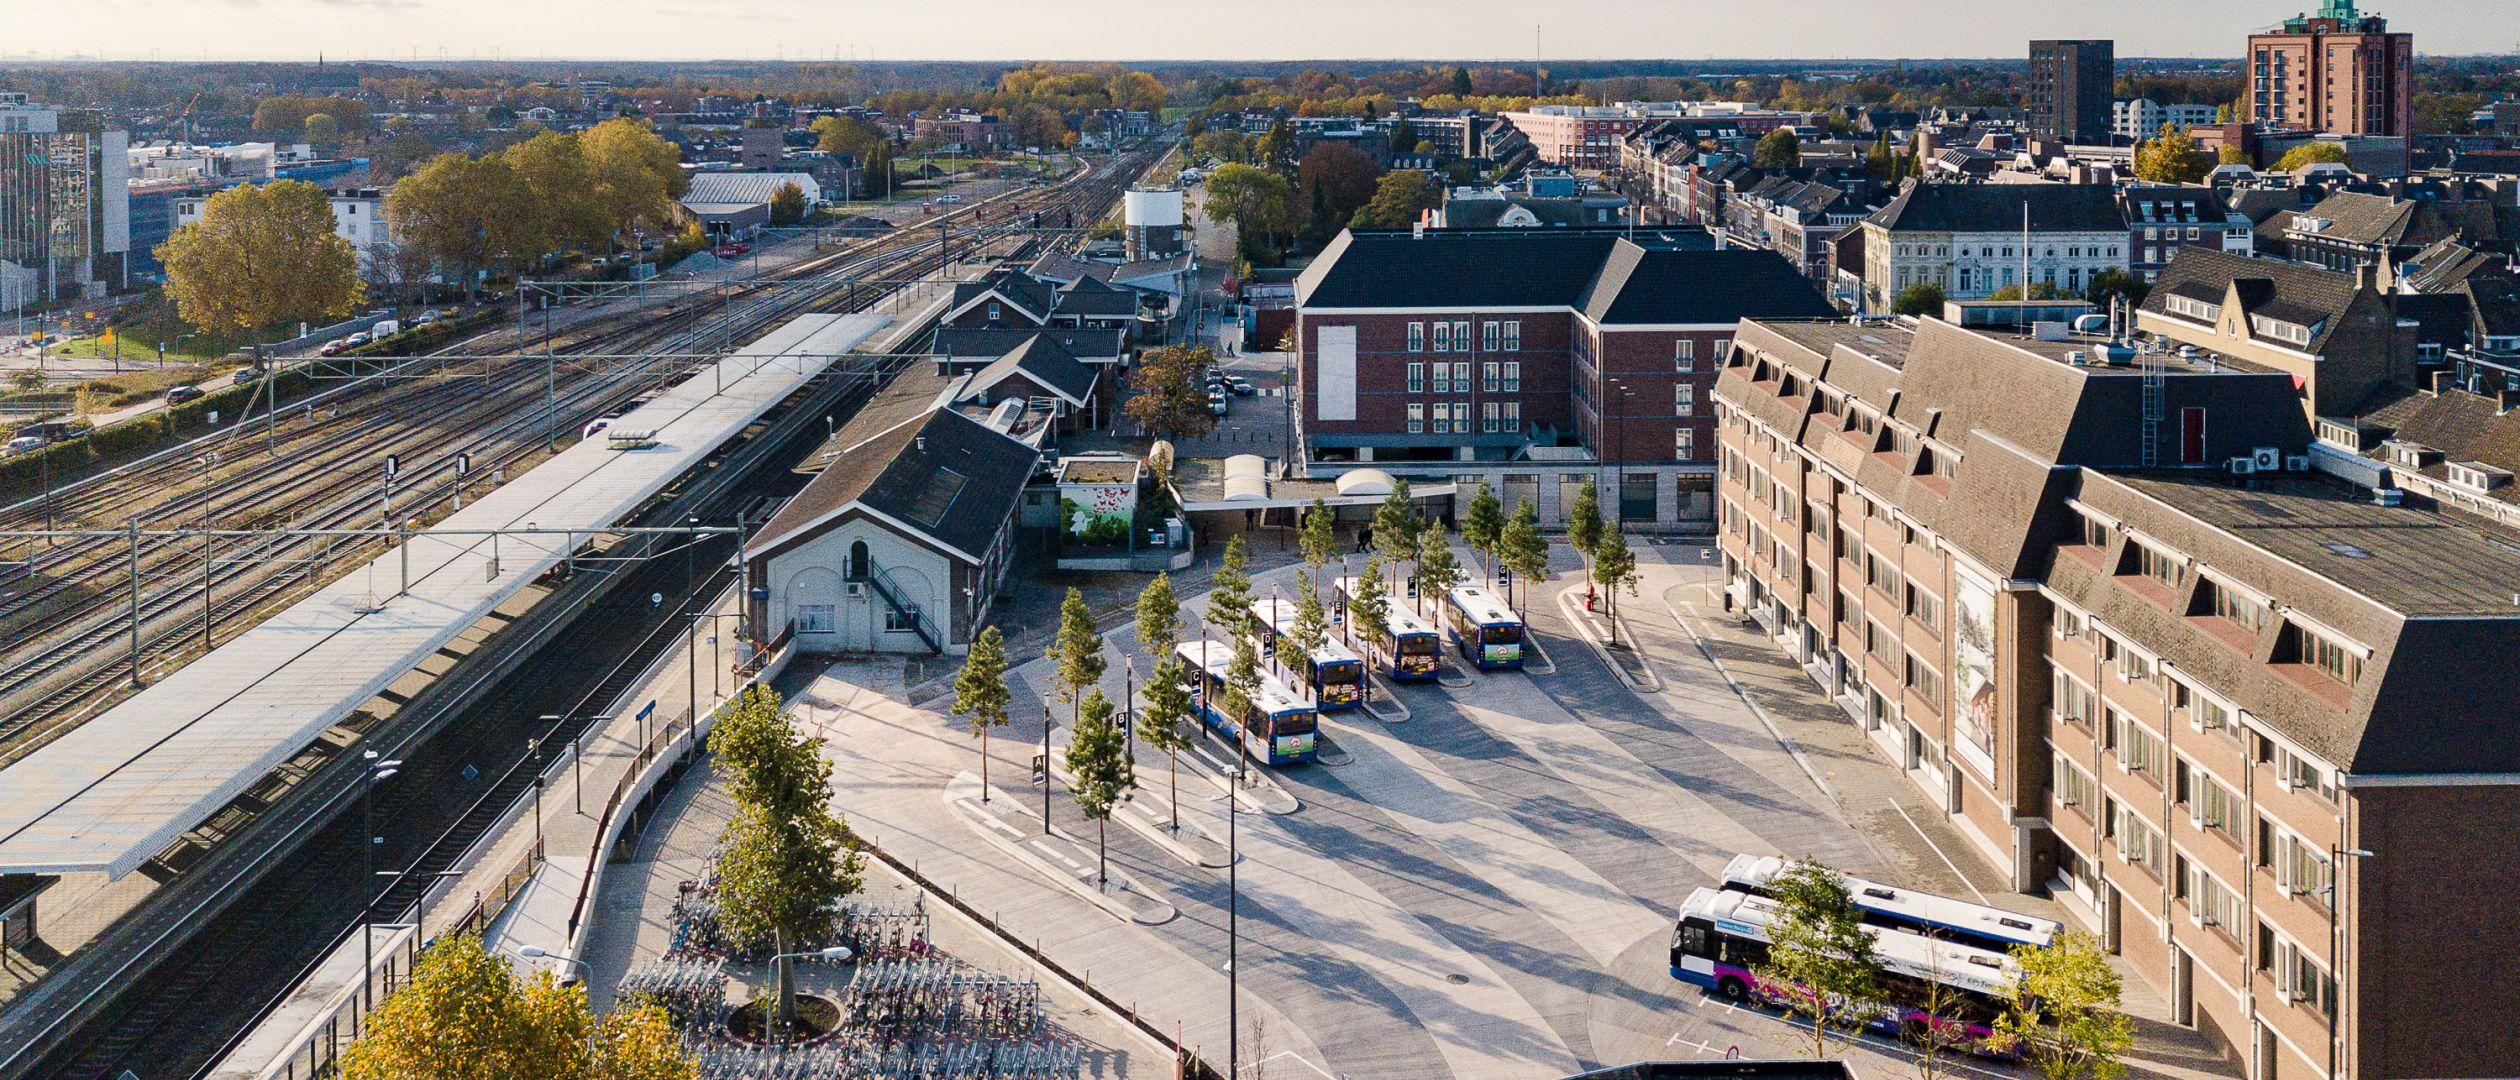 Stationsgebied Roermond